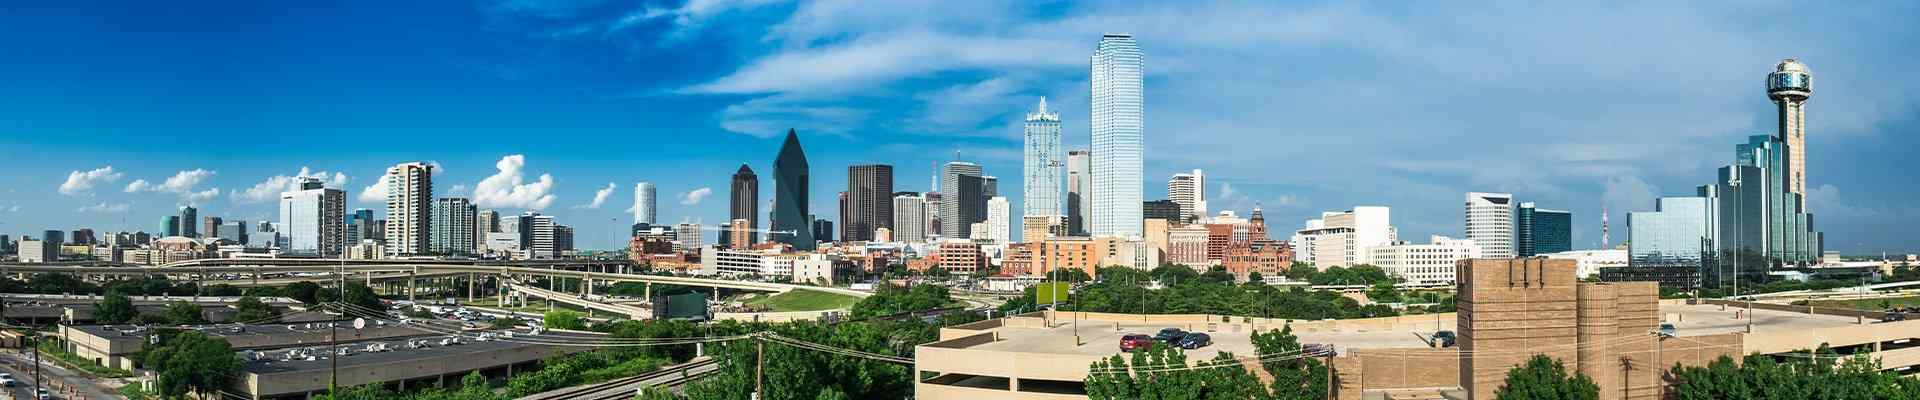 skyline panorama of the city of dallas texas